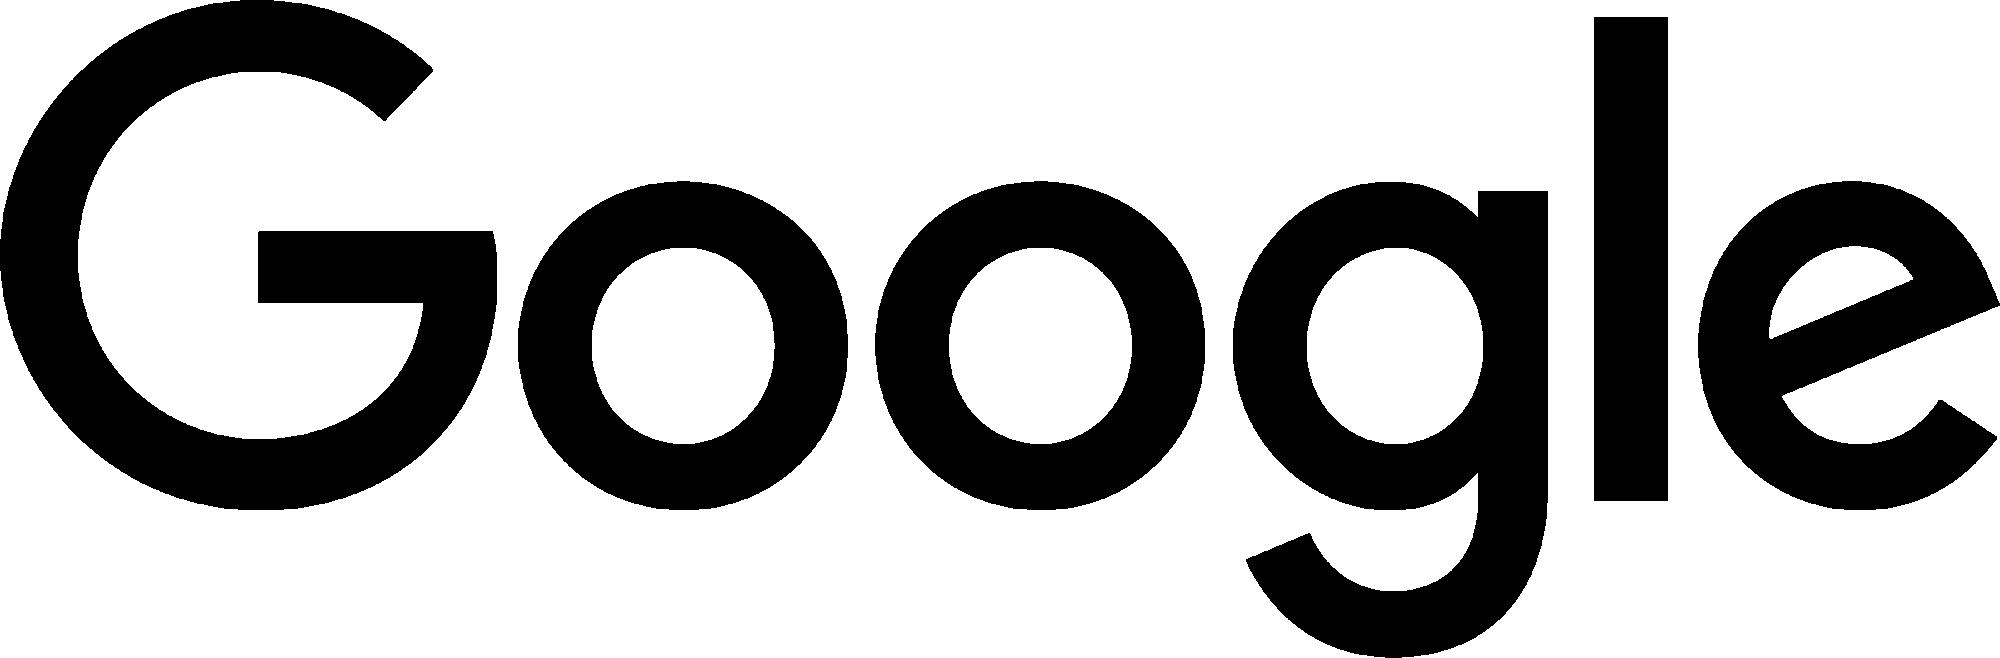 google_png19624.png